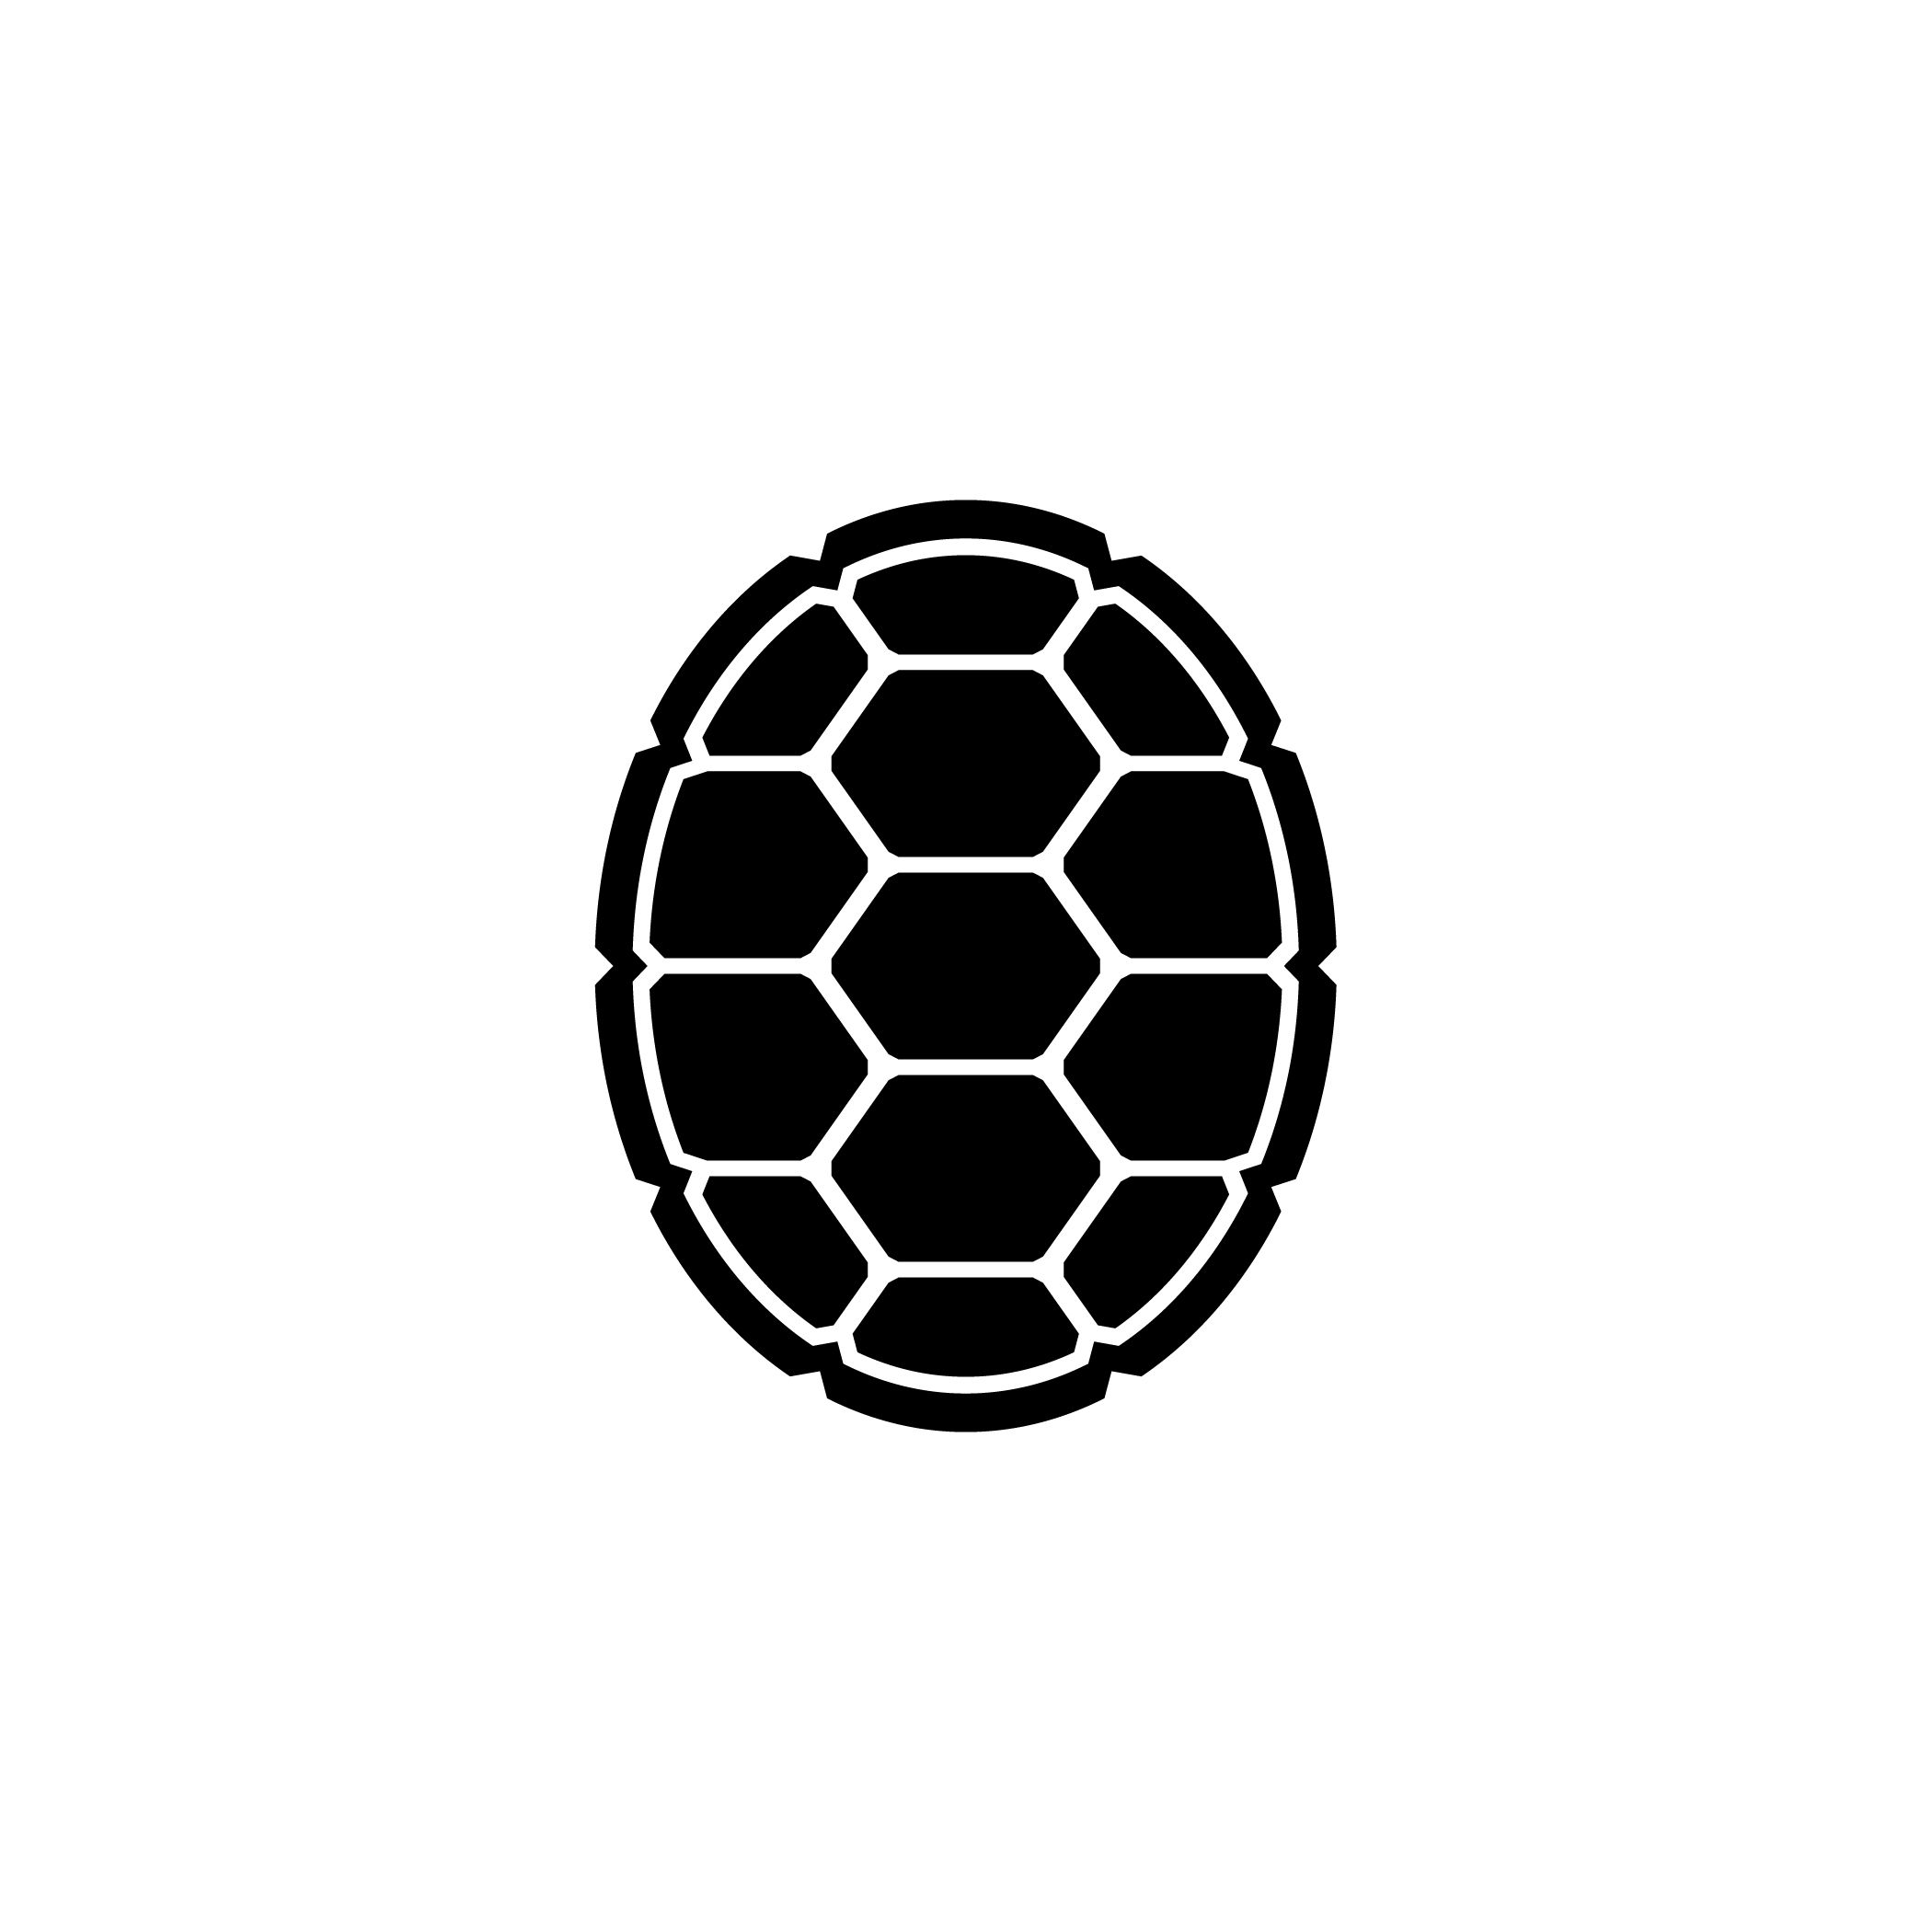 Slider Turtle Red Outline Clipart | Ninja turtle shells ...